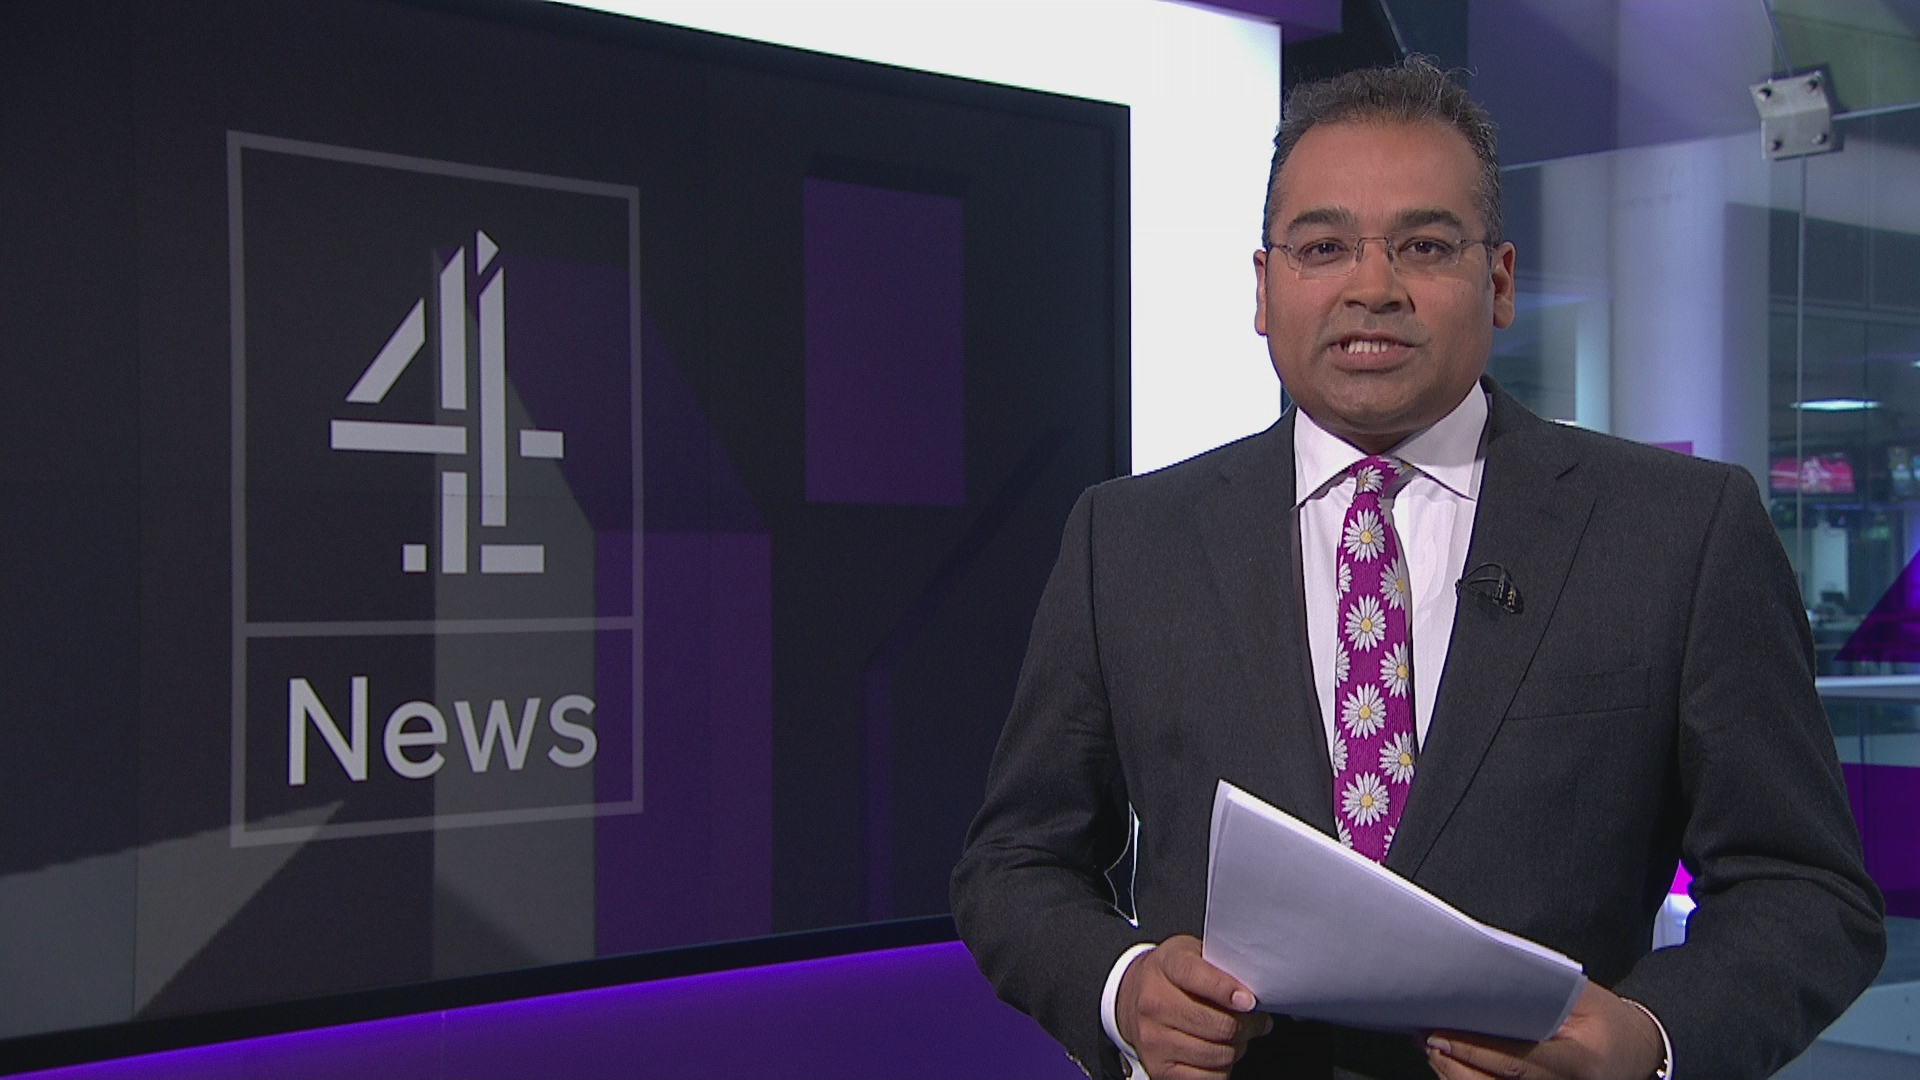 channel 4 news headlines  u2013 channel 4 news